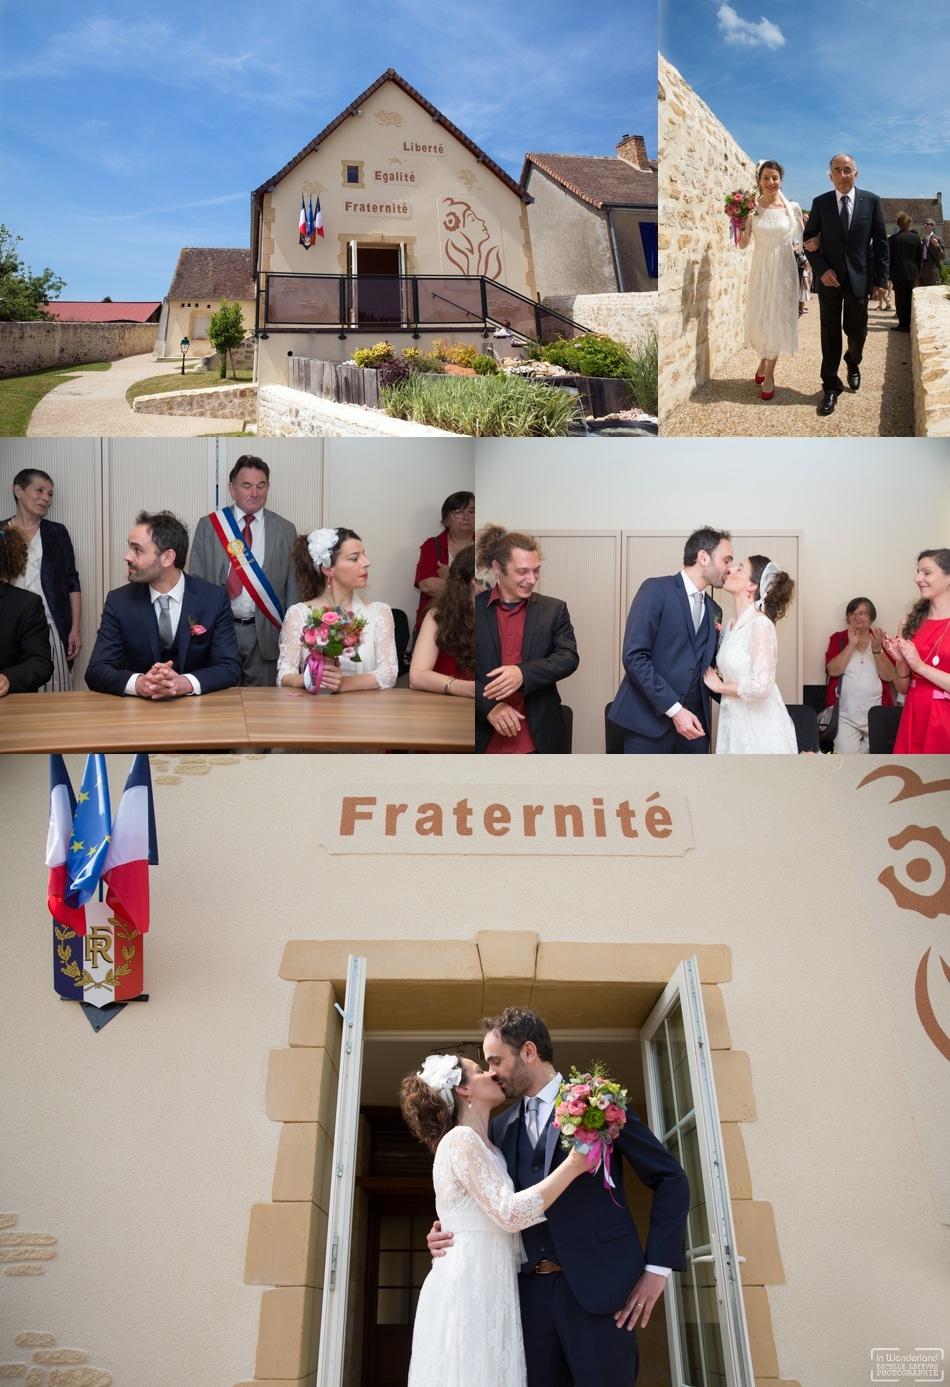 photographe de mariage original dans la sarthe - Gite Sarthe Mariage